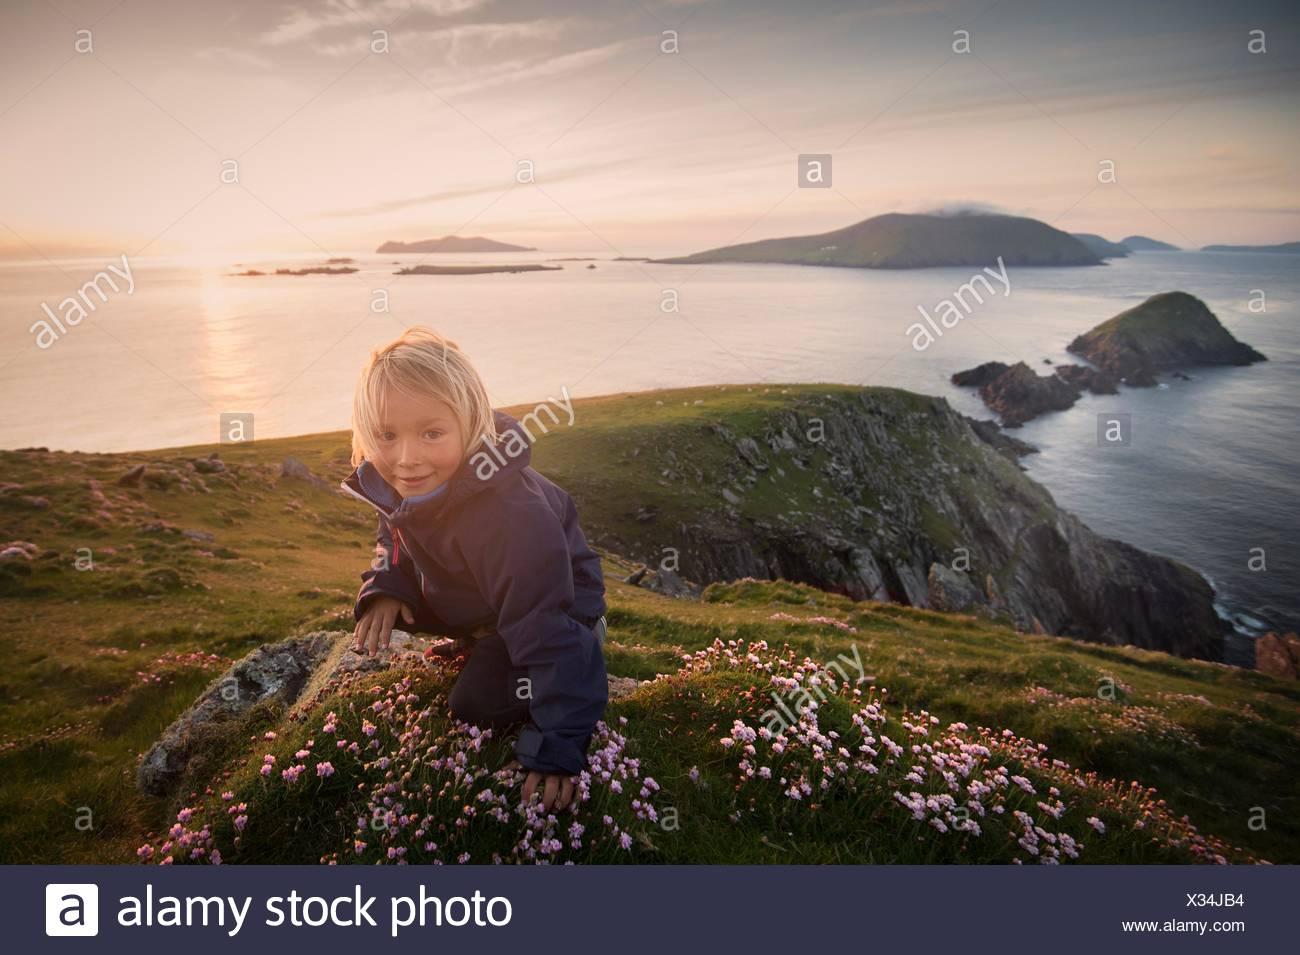 Young boy sitting on hillside, Slea head, County Kerry, Ireland - Stock Image